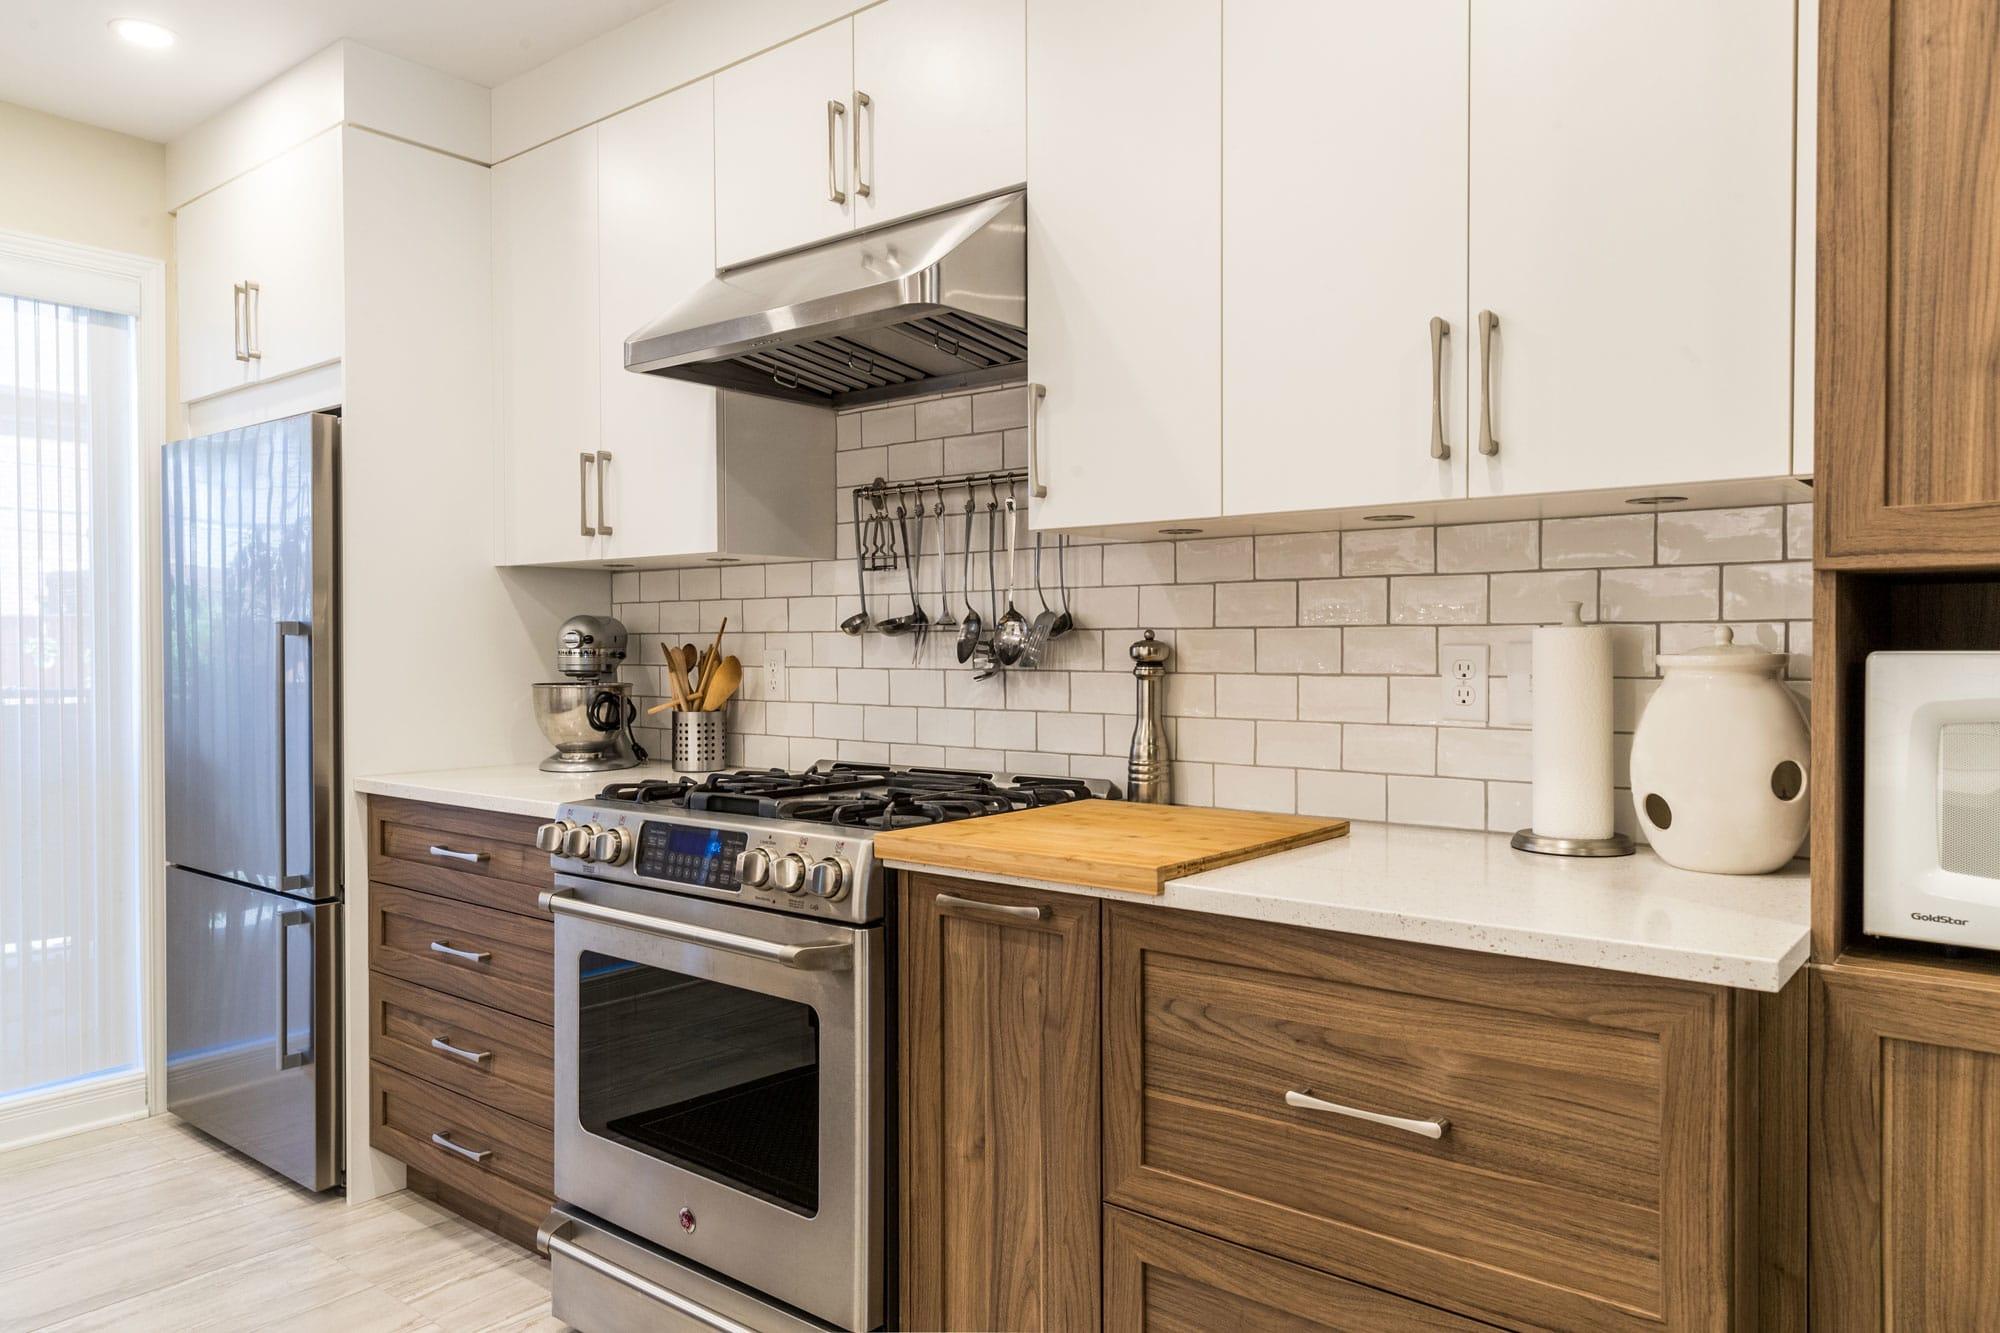 two tone kitchen cabinets with quartz countertop